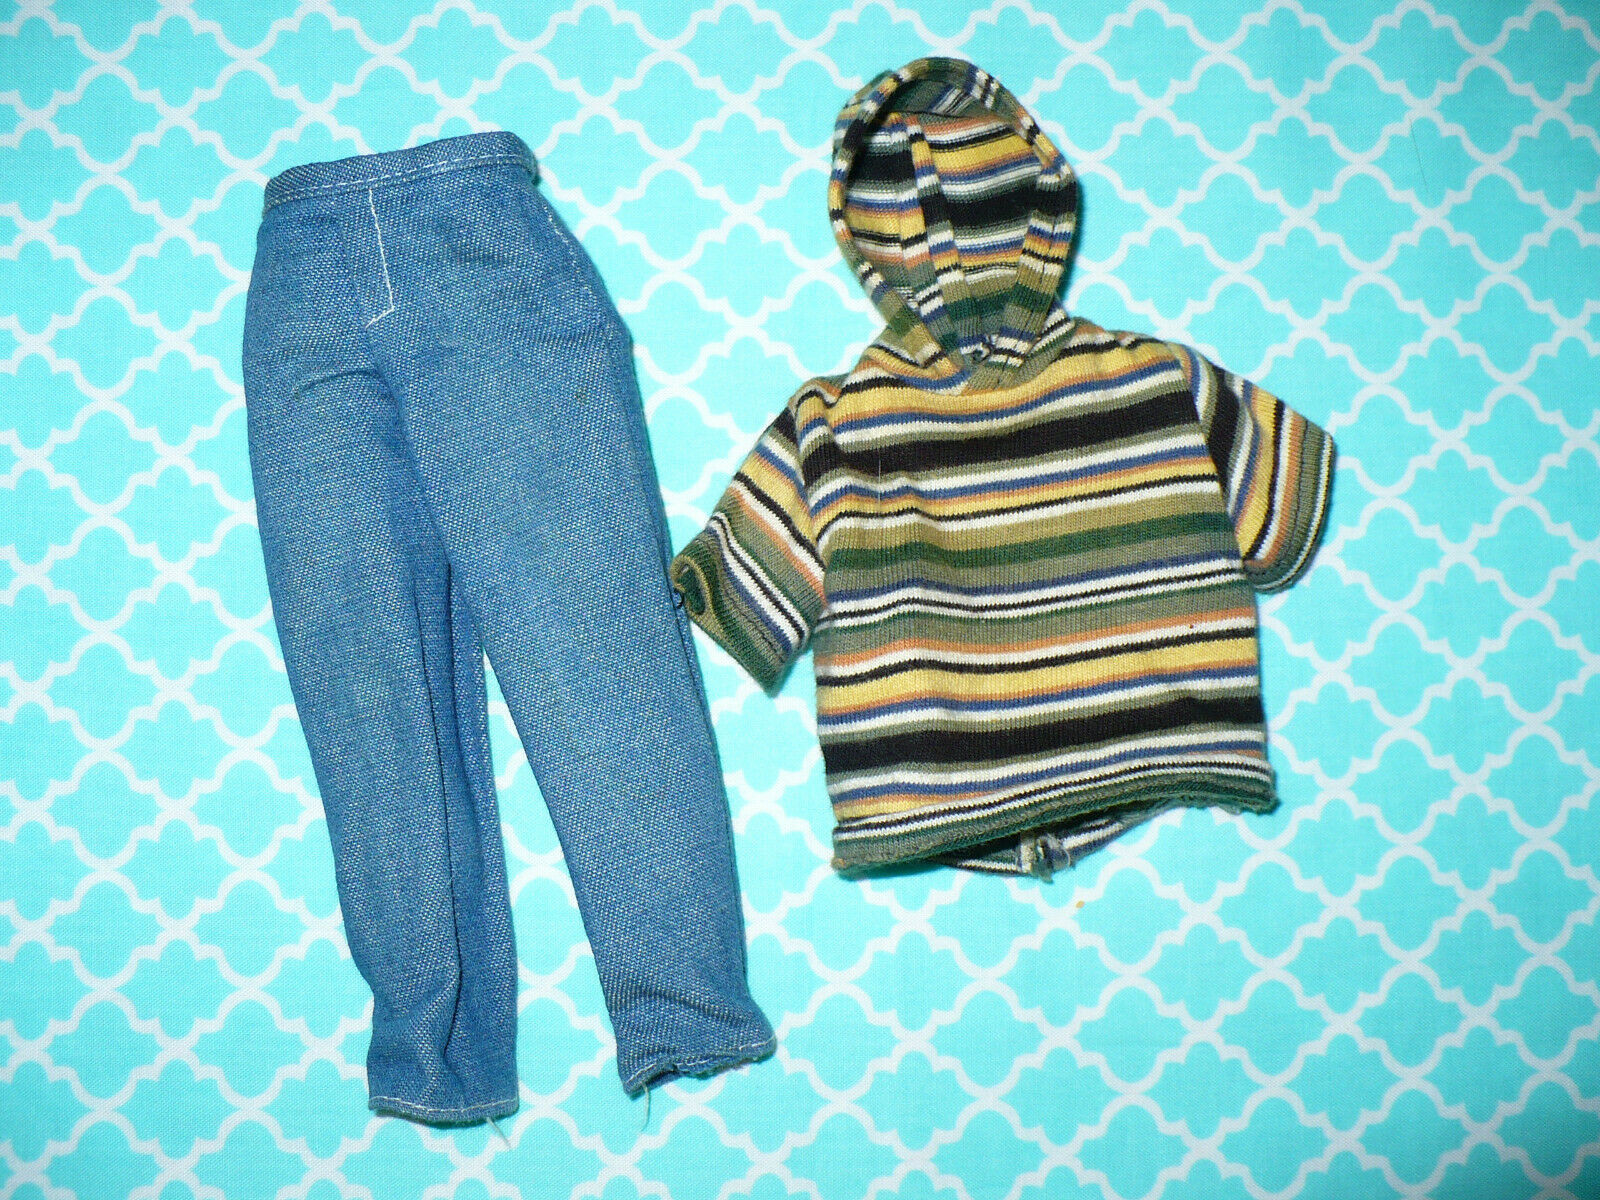 Mattel Barbie KEN DOLL 1990 s CLOTHING LOT 2 Pc SHIRT Hoodie JEANS PANTS  - $15.99